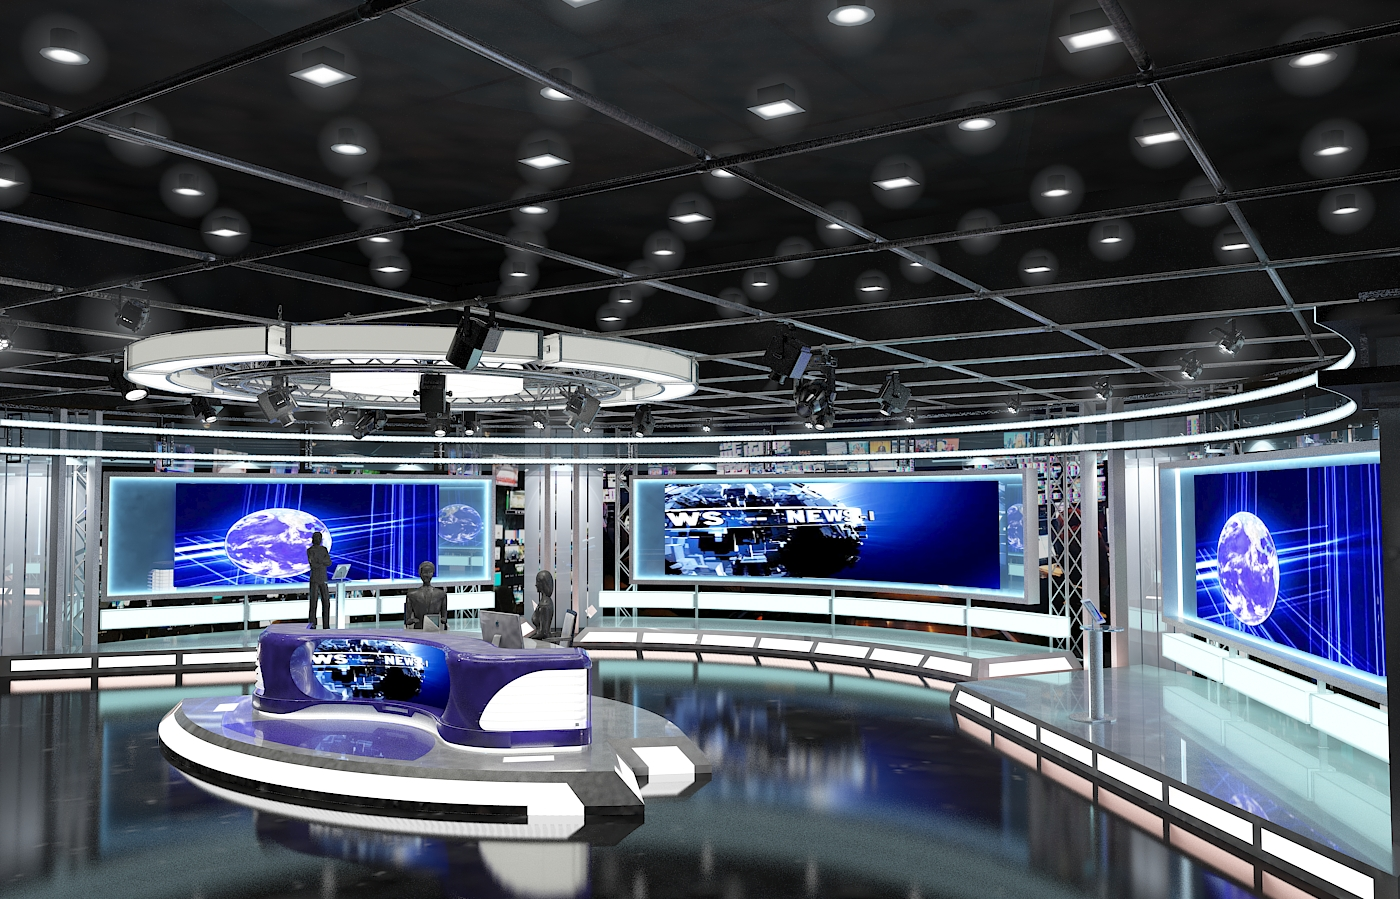 виртуал телевизийн студи цуглуулга vol 6 3d загвар max dxf dwg fbx obj 223366